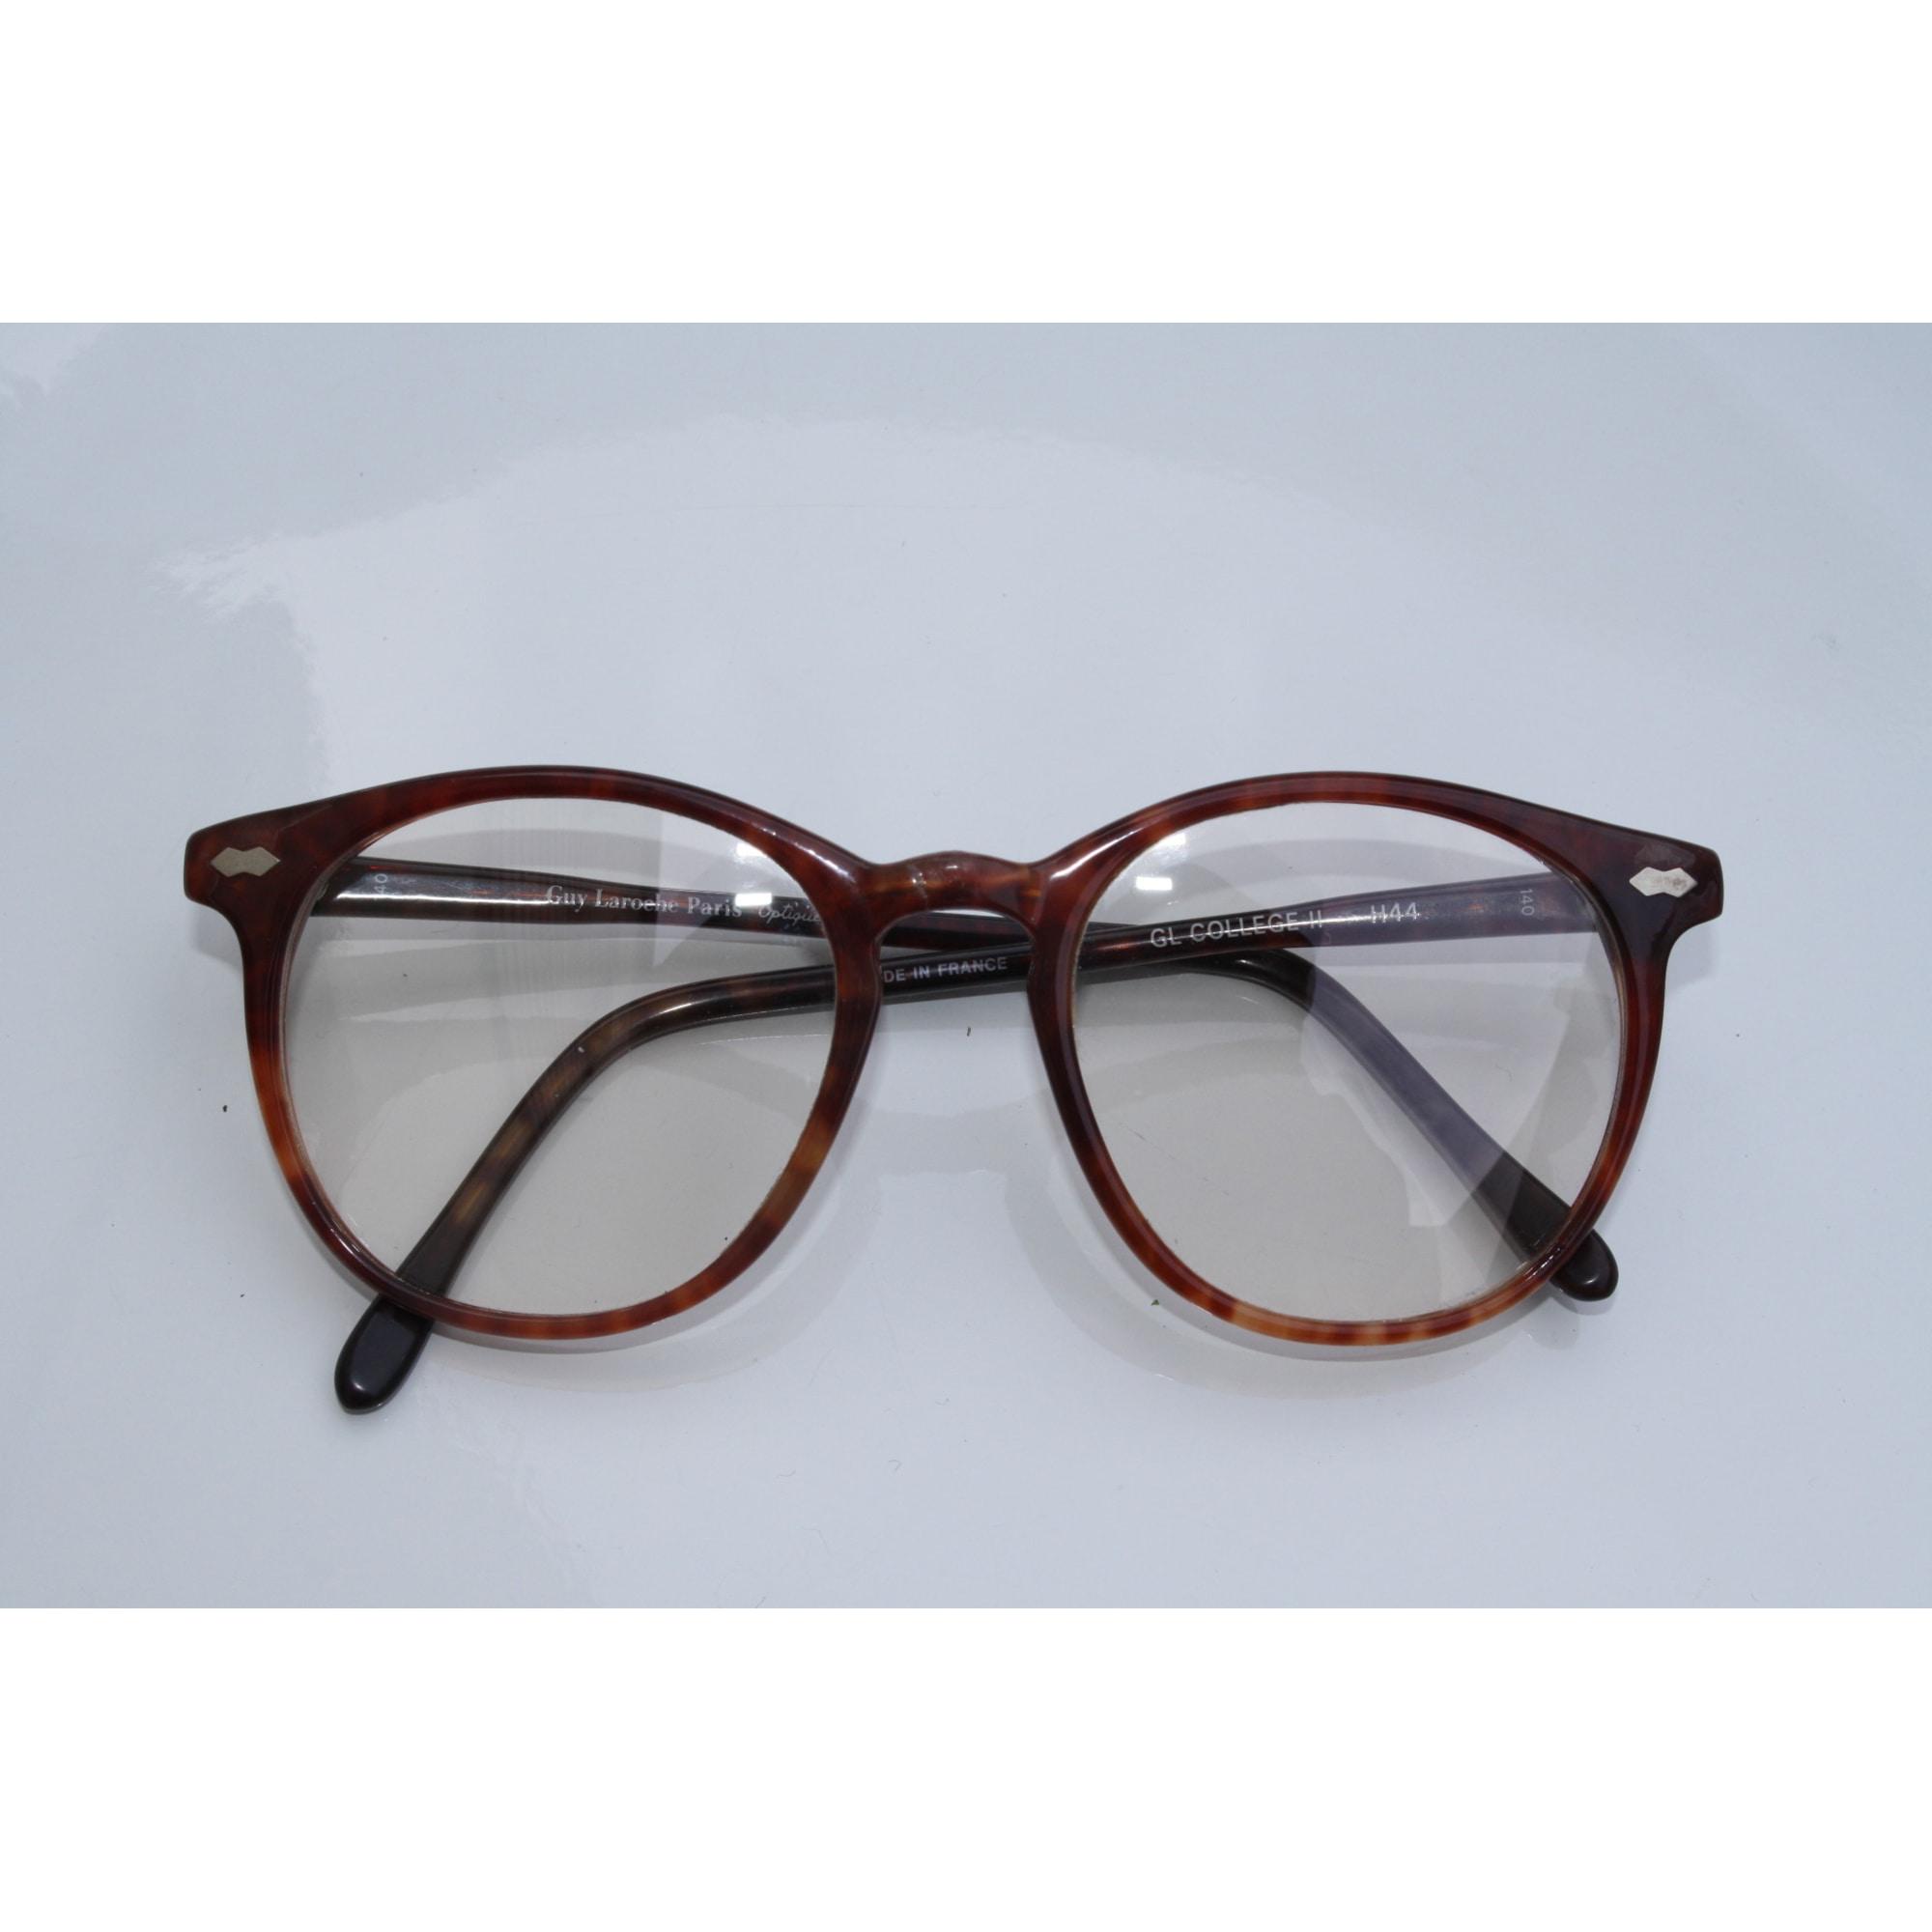 Montures lunettes guy laroche